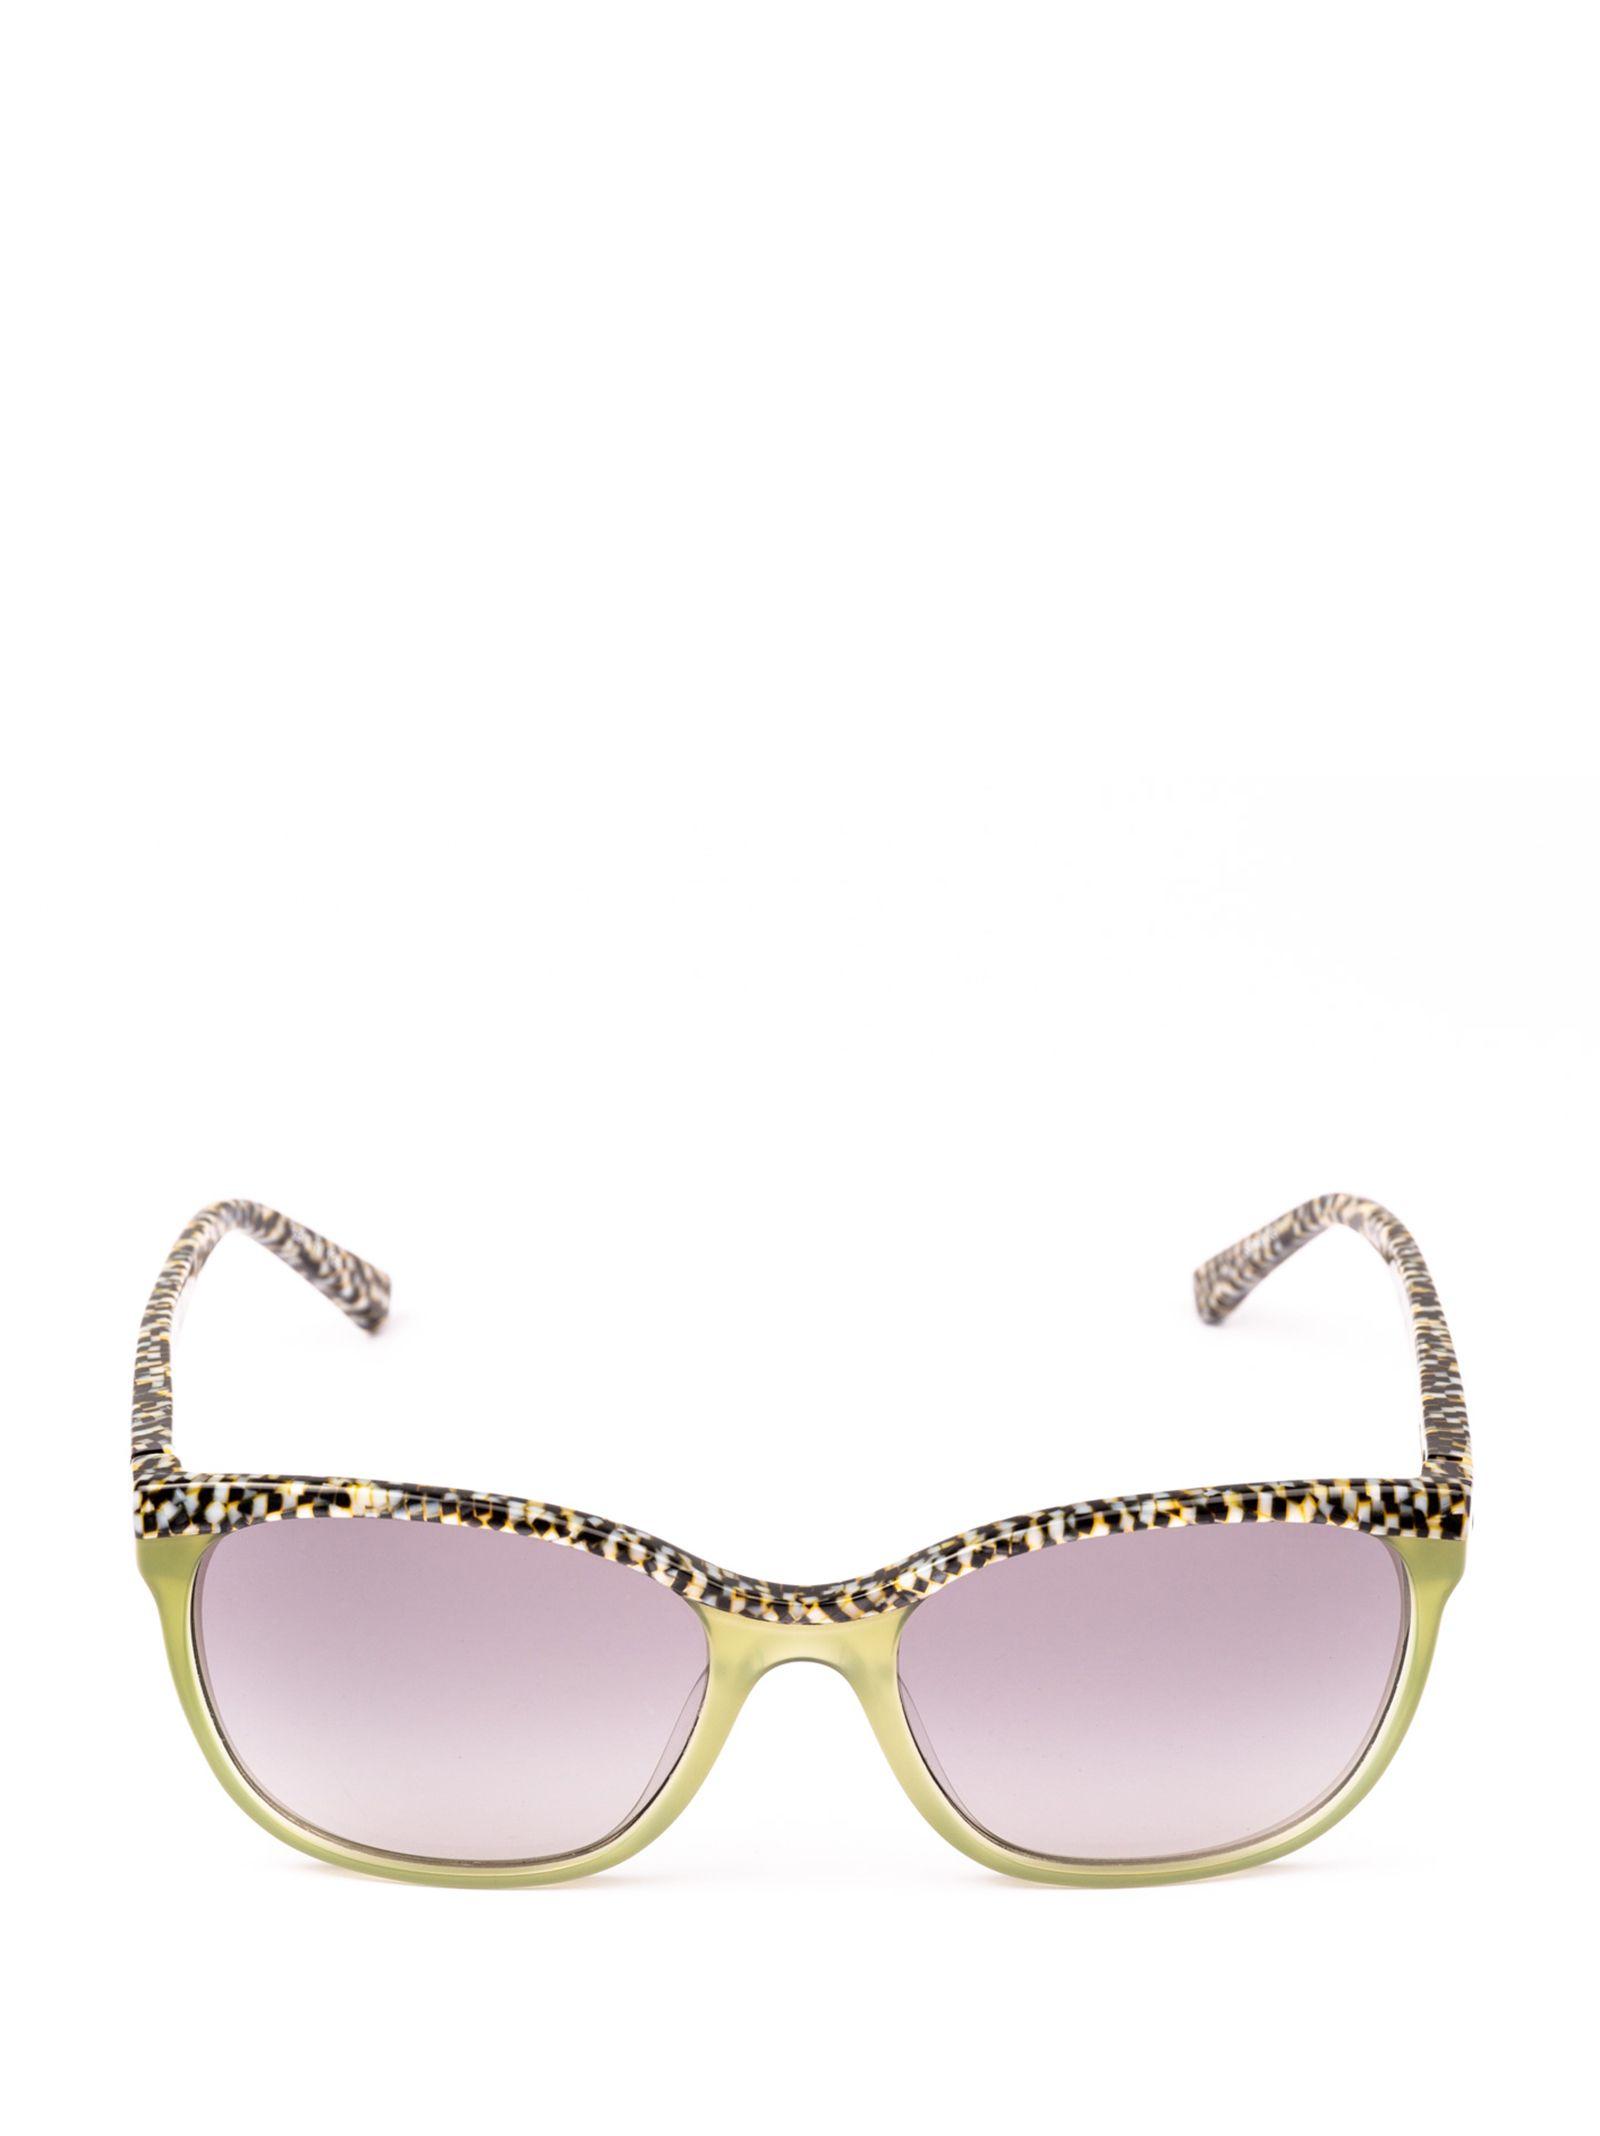 ETNIA BARCELONA Sunglasses in Grch